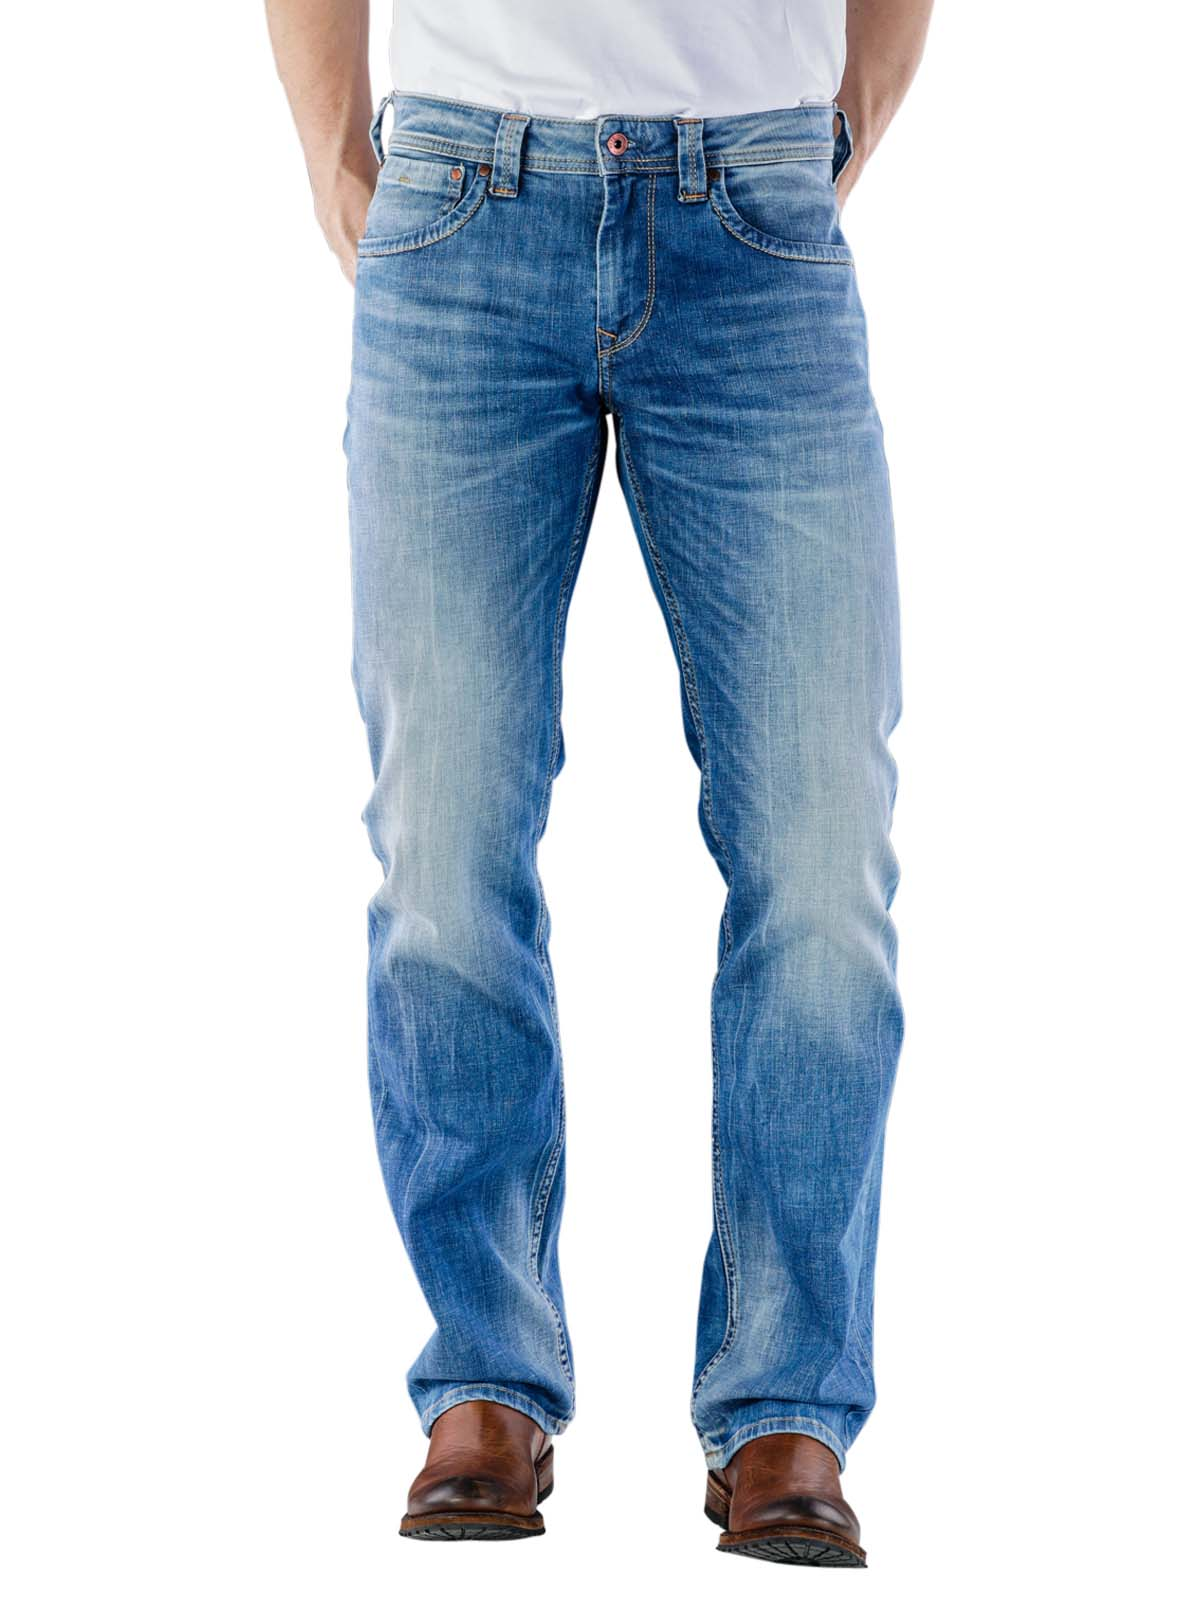 Pepe Jeans Kingston Zip Medium Used Denim Pepe Jeans Men S Jeans Free Shipping On Bebasic Ch Simply Look Good